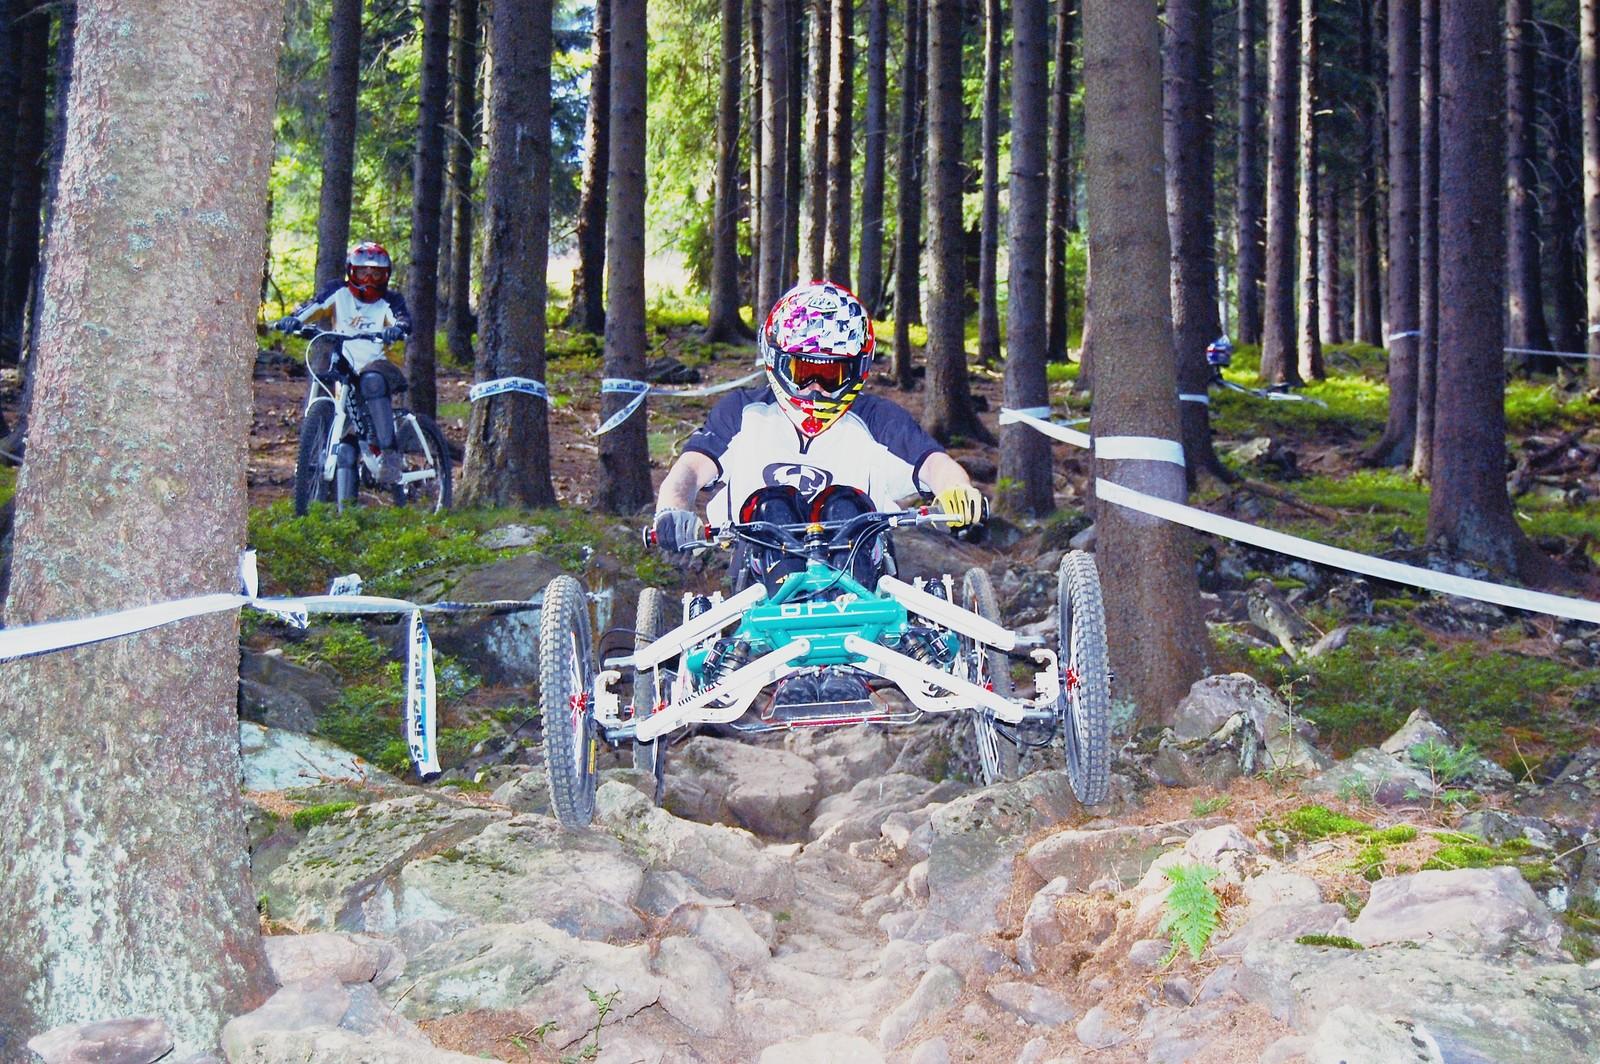 DSC 0030u - wozikmajkl83 - Mountain Biking Pictures - Vital MTB